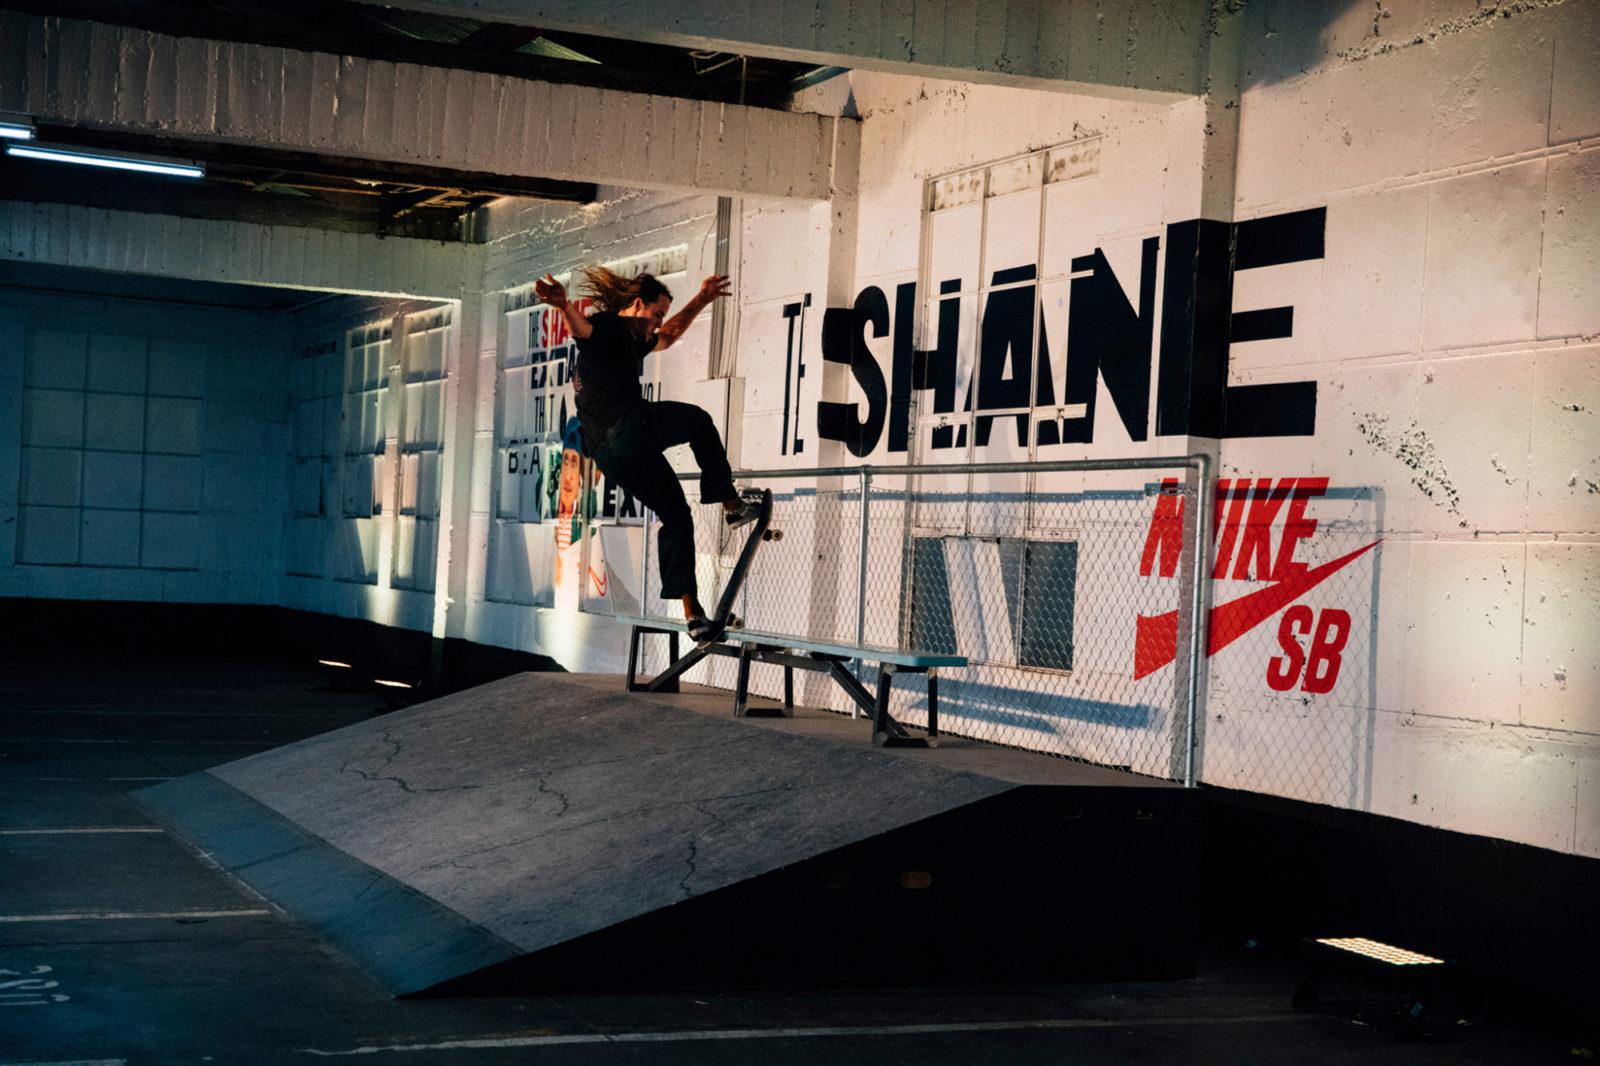 Web space between nike sb the shane 9